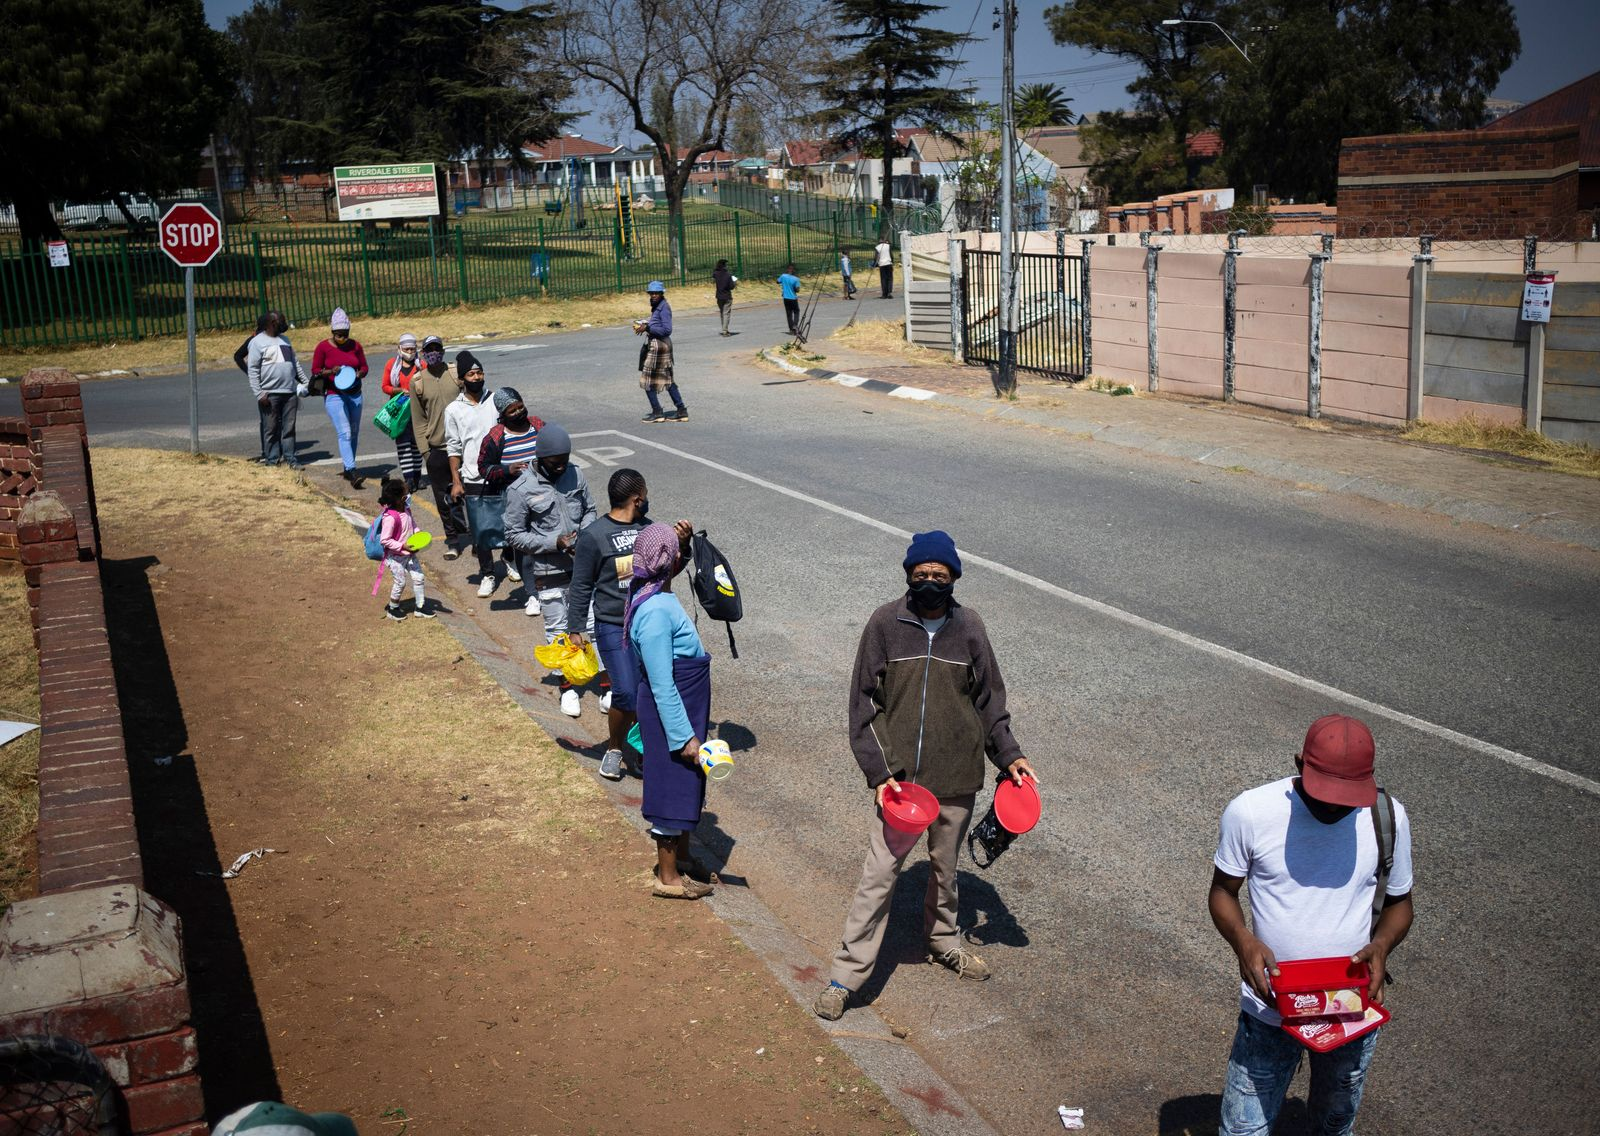 South Africa covid-19 lockdown food handout, Johannesburg - 03 Sep 2020